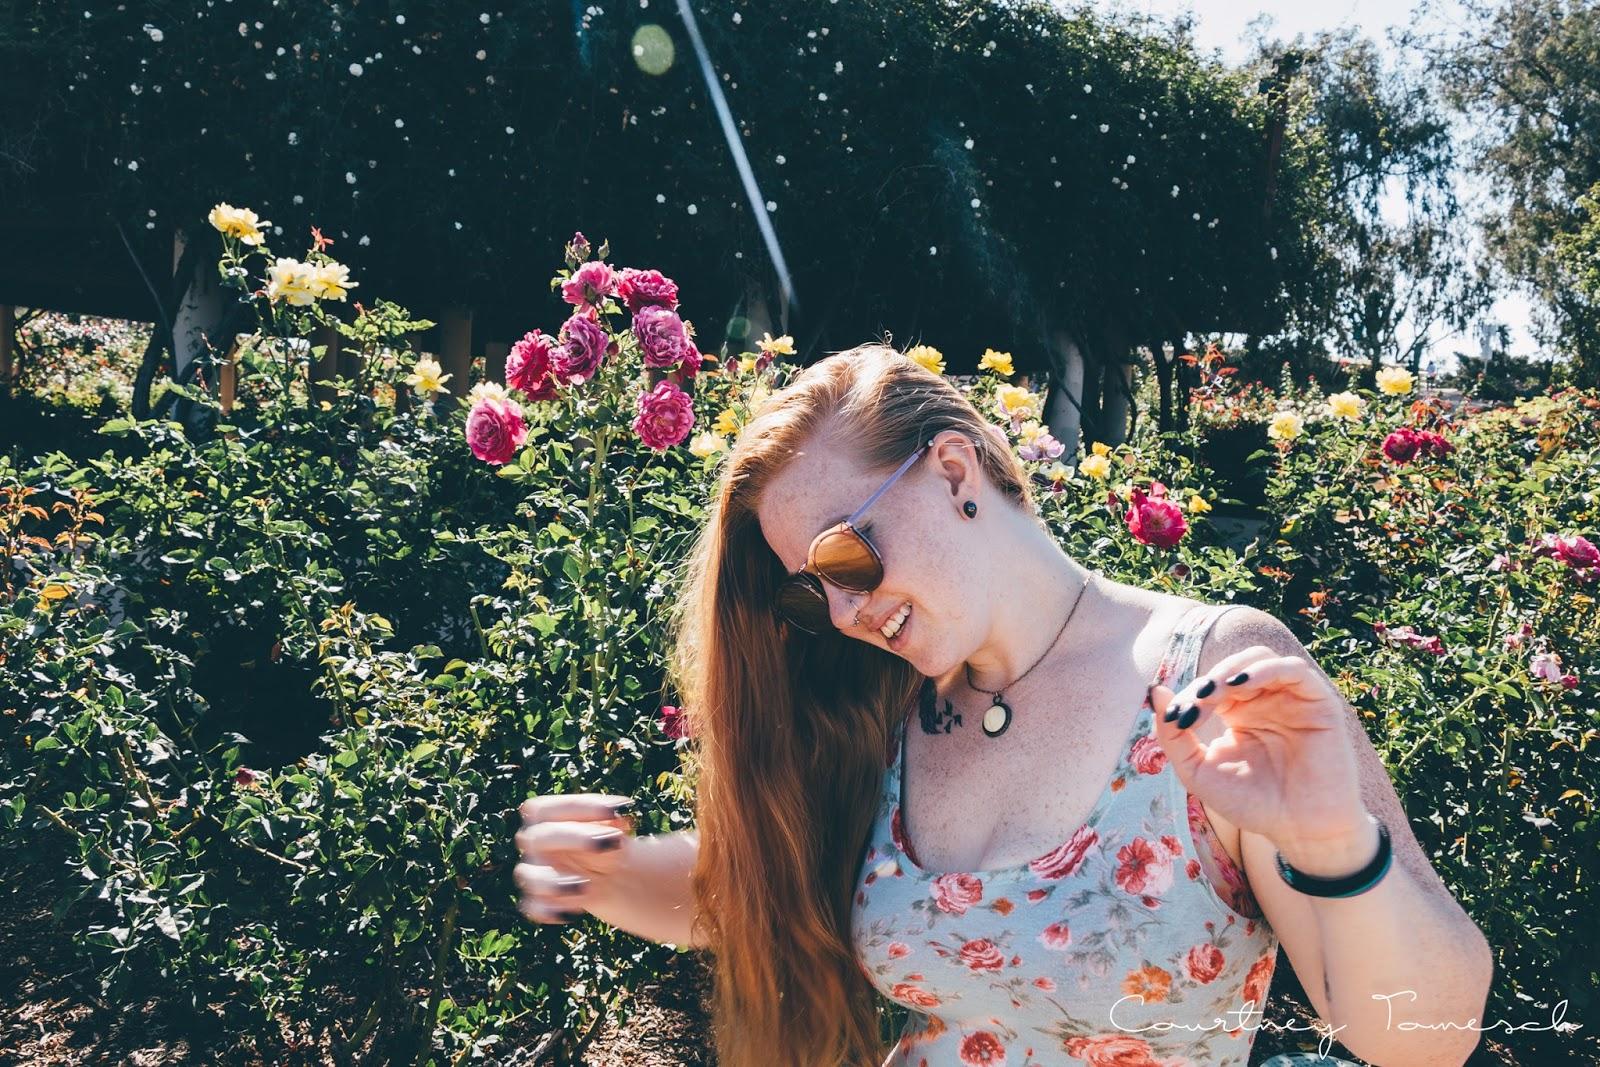 Balboa Park Rose Garden Portraits San Diego California